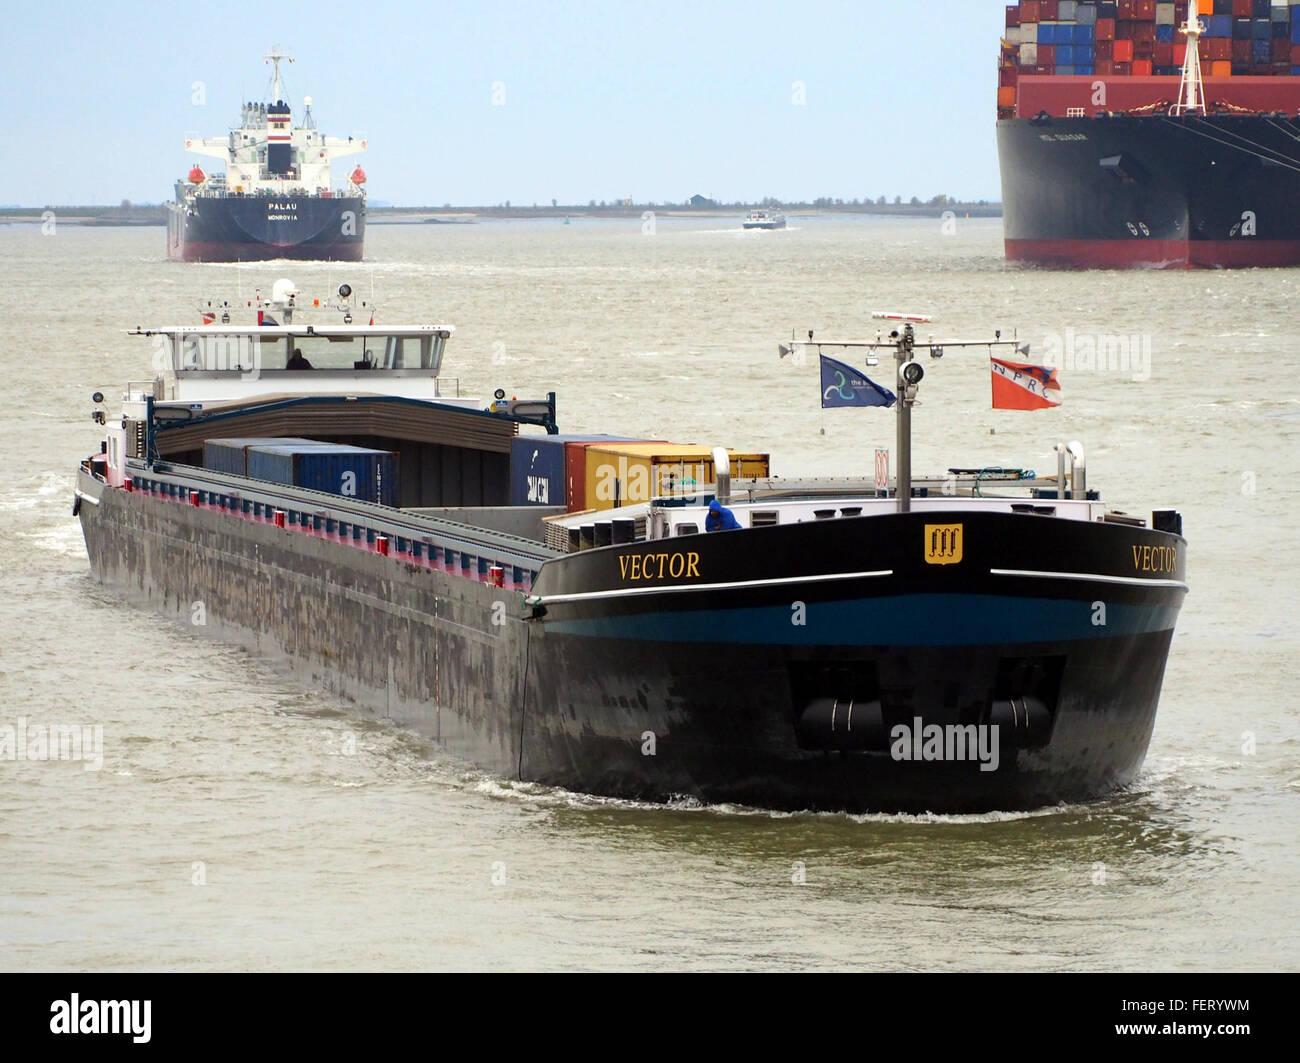 Vector (barco, 2008), ENI 02331015 Puerto de Amberes pic1 Imagen De Stock